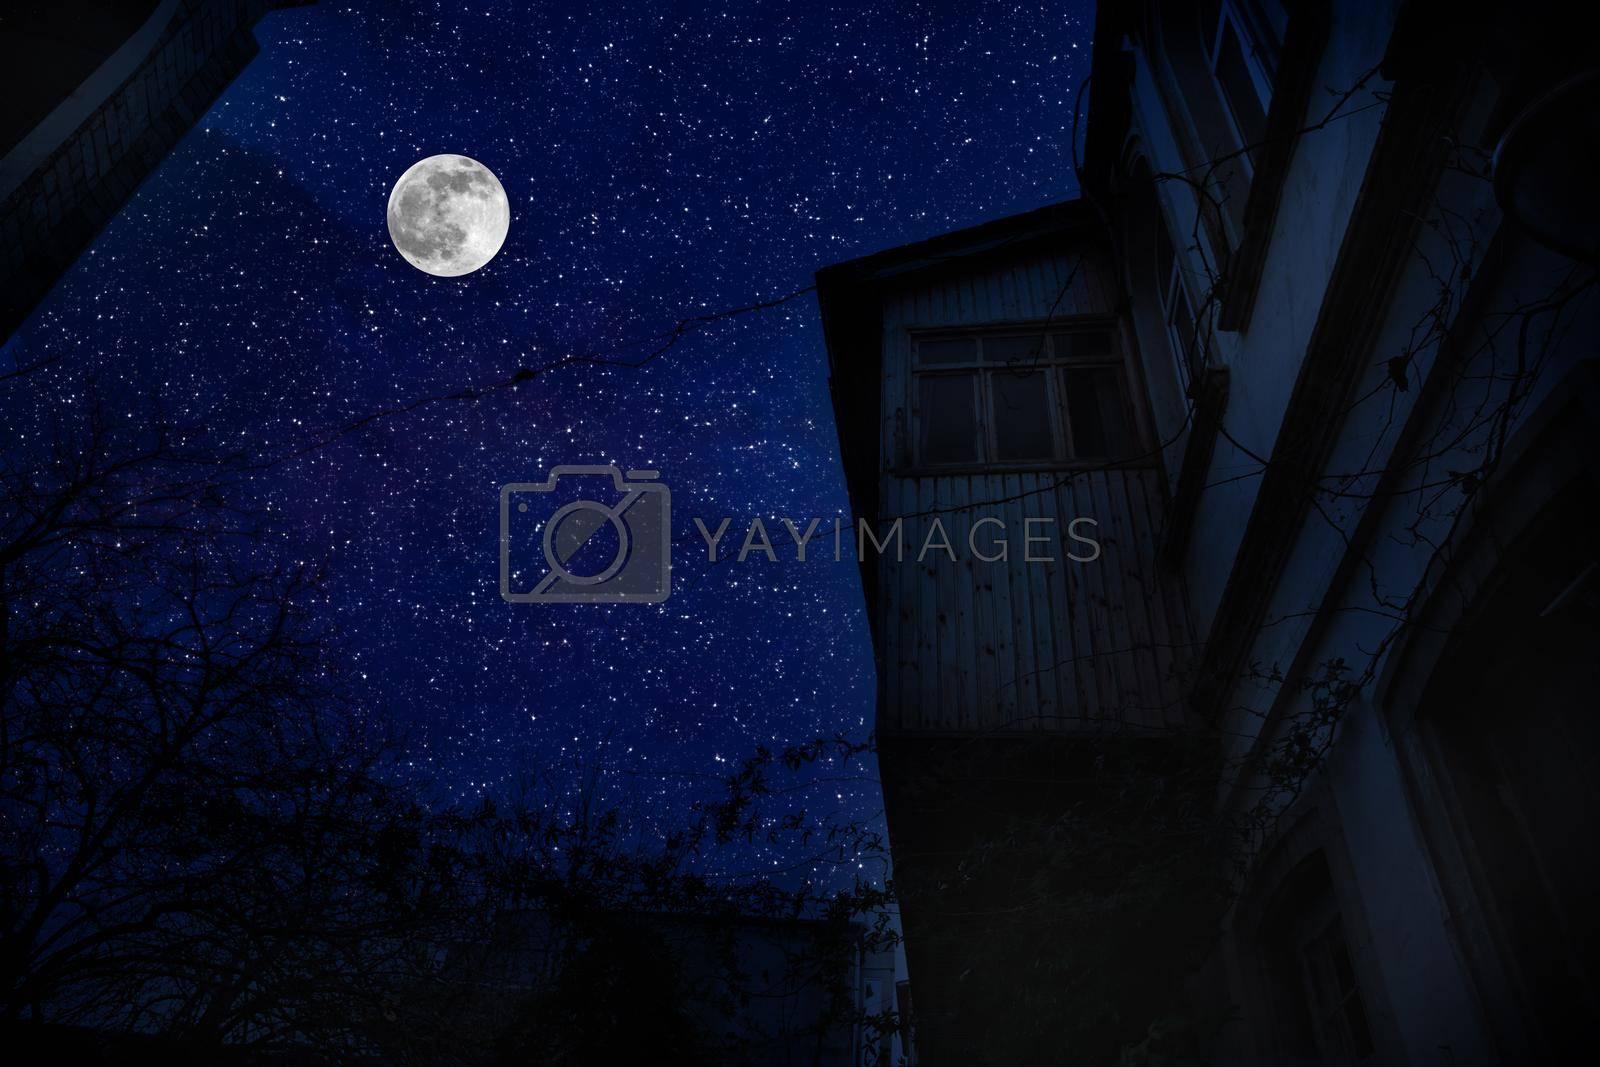 Old city streets at night. Full moon over the city at night, Baku Azerbaijan. Big full moon shining bright over buildings